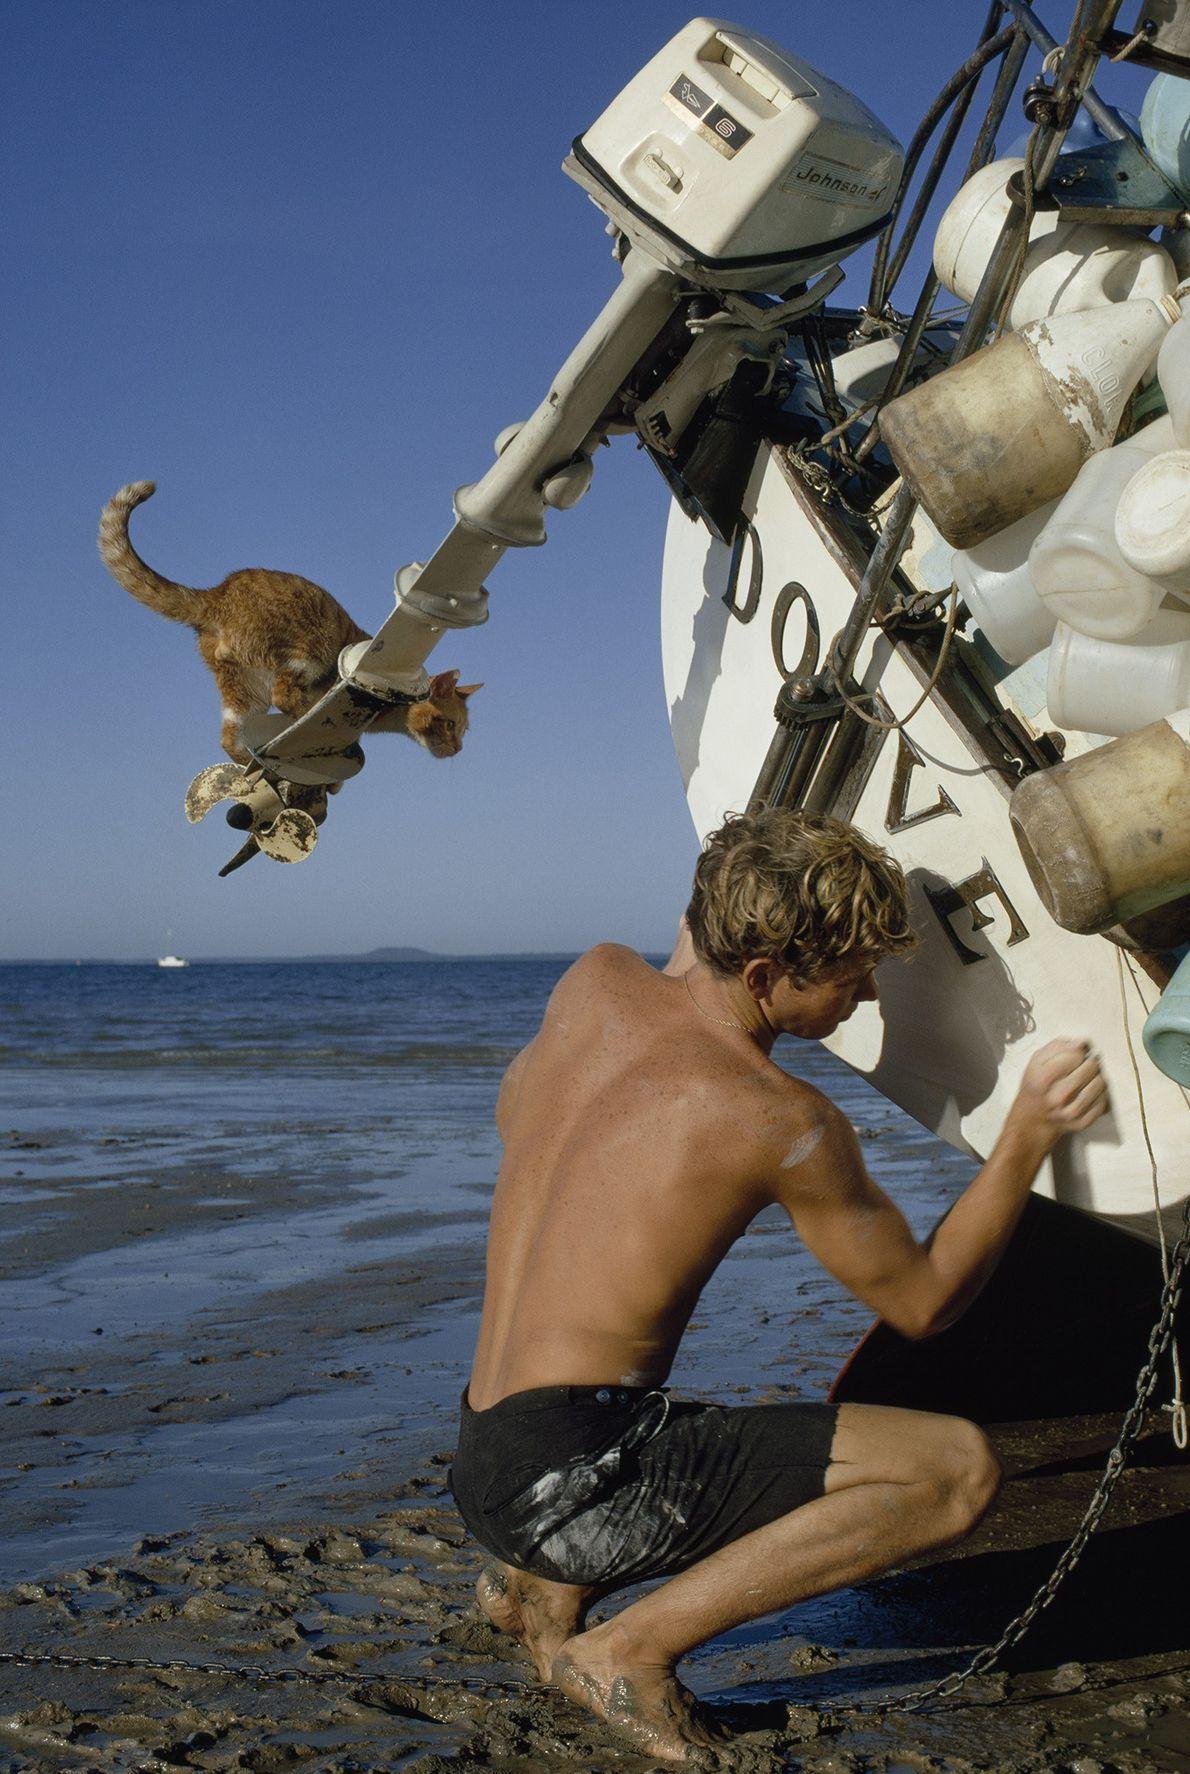 While teenage sailor Robin Lee Graham scrubs his boat on a beach near Darwin, Australia, his ...